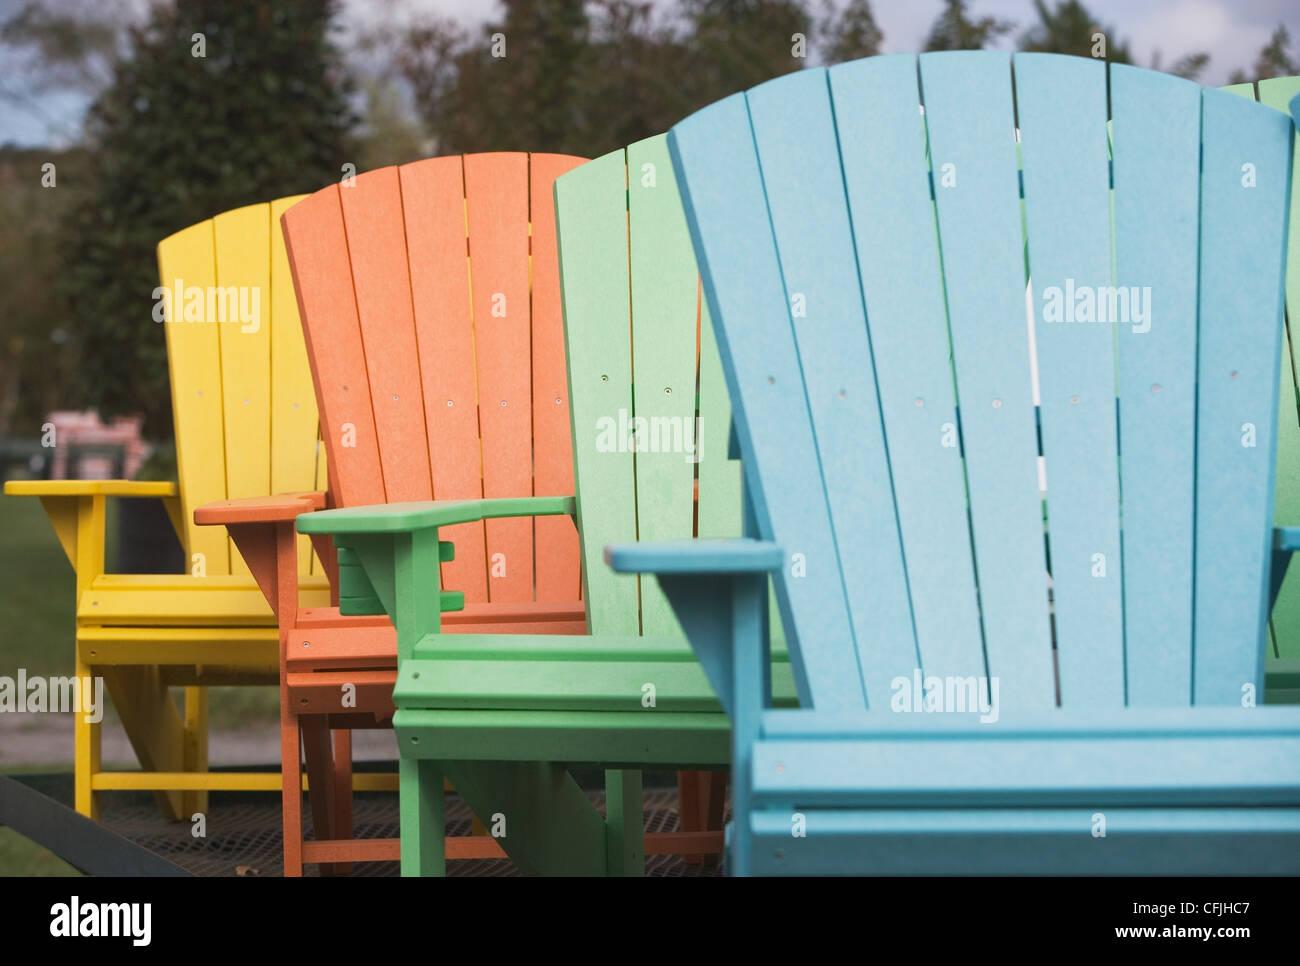 Bemalte Stühle bemalte stühle stockfoto bild 44049383 alamy